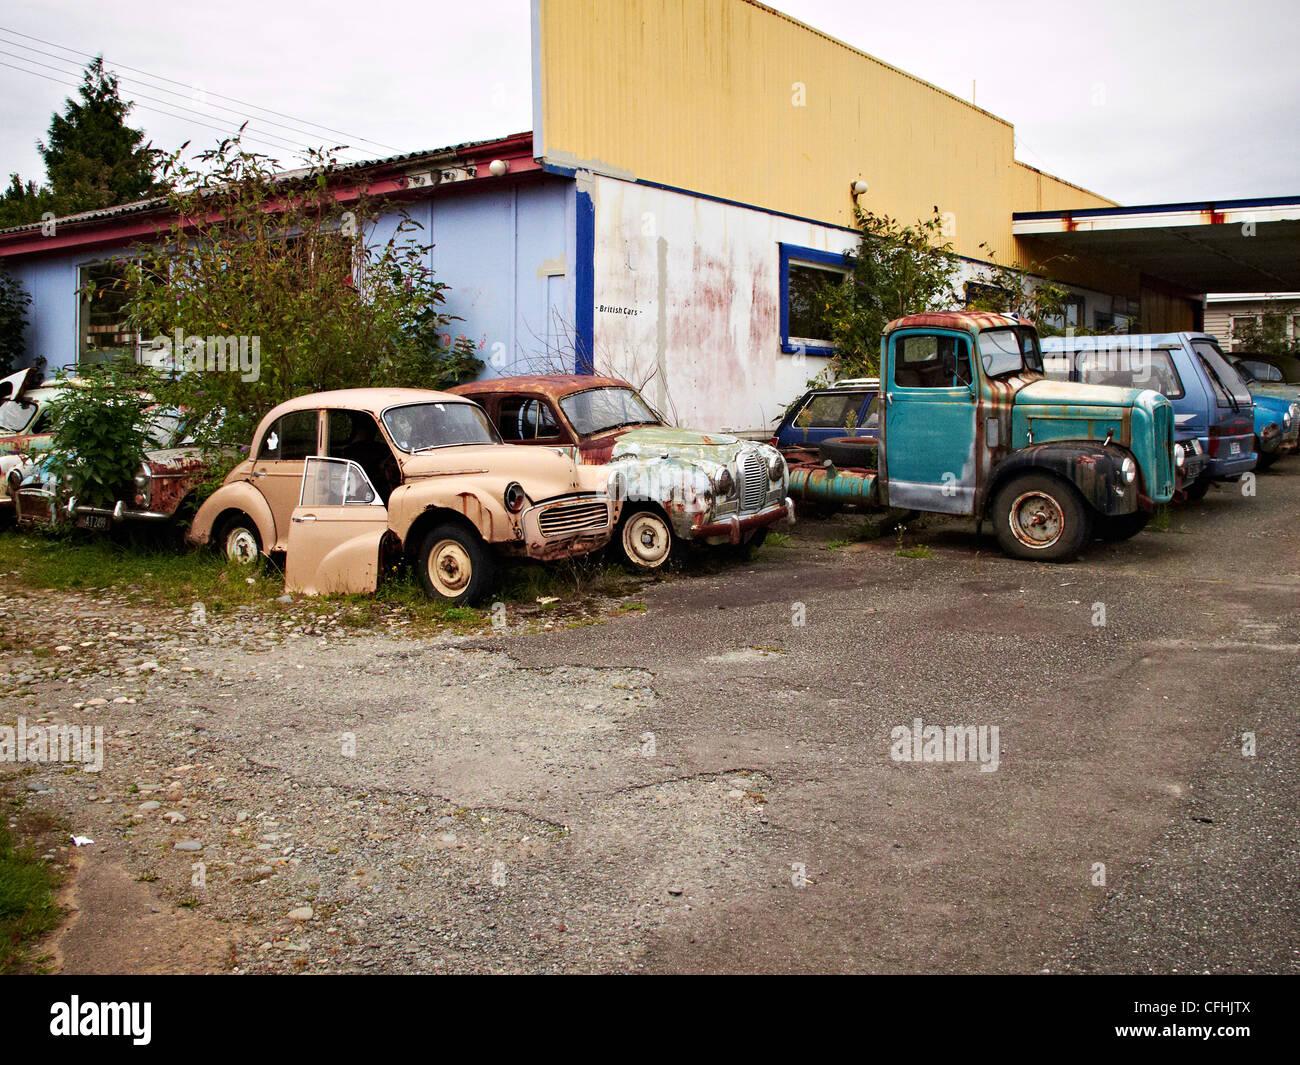 Buy Classic Cars Nz